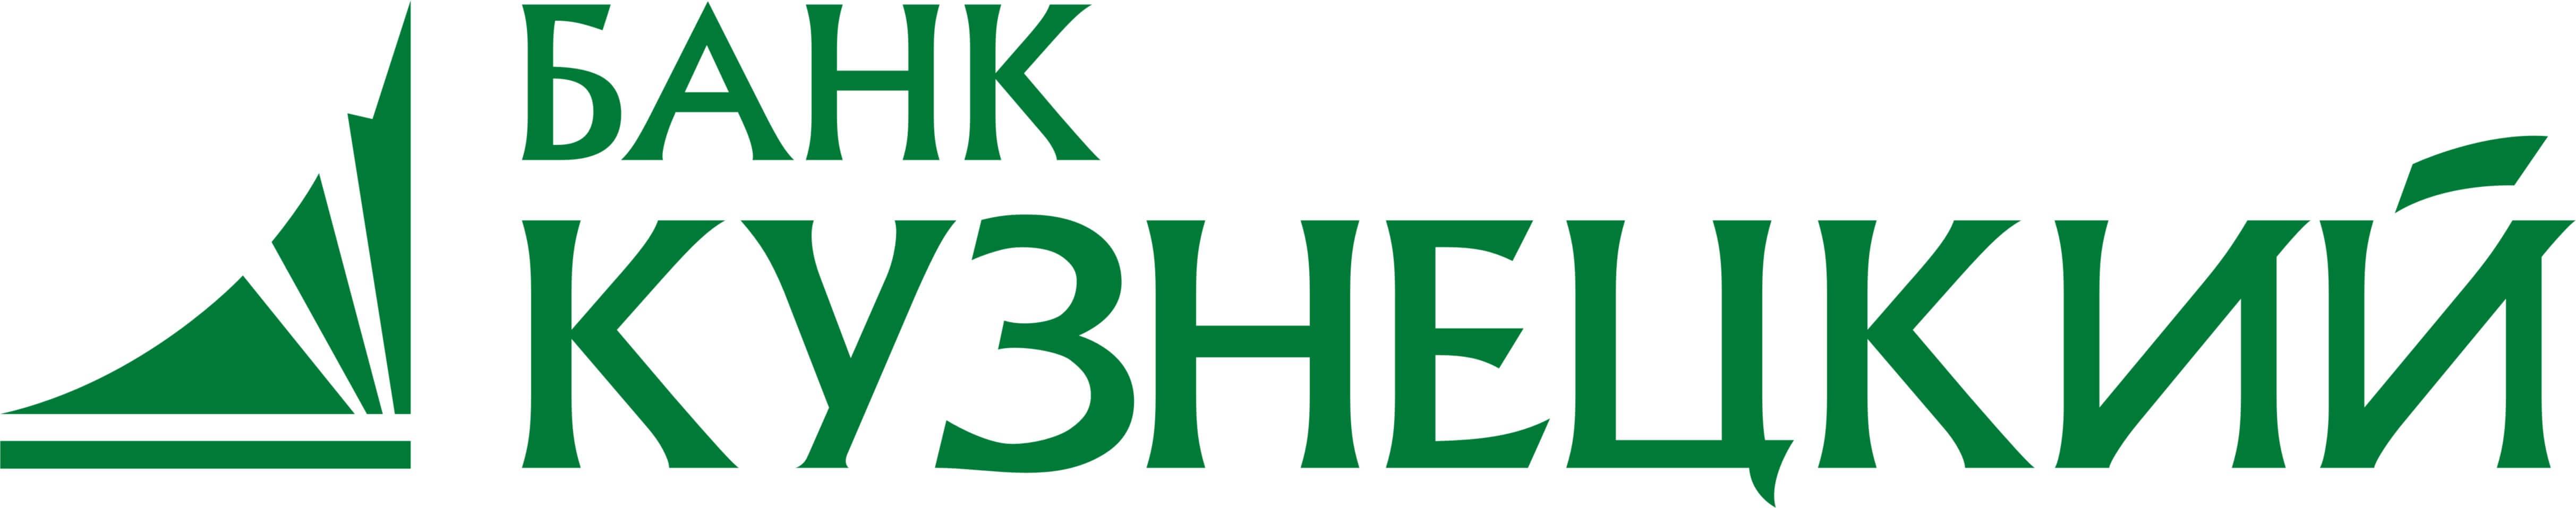 Банк Кузнецкий